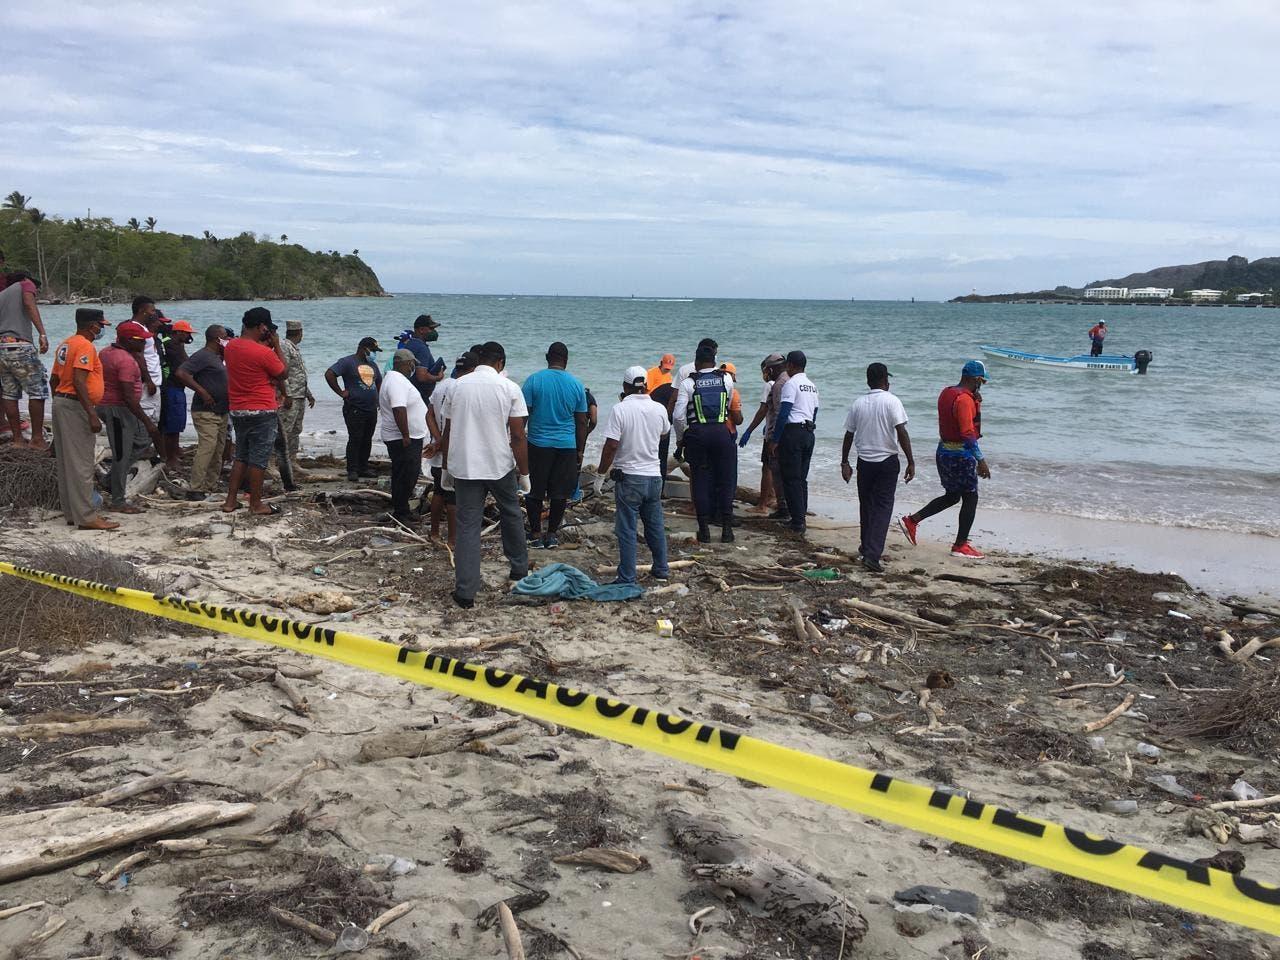 Hallan cadáver de hombre flotando en una playa de Maimón